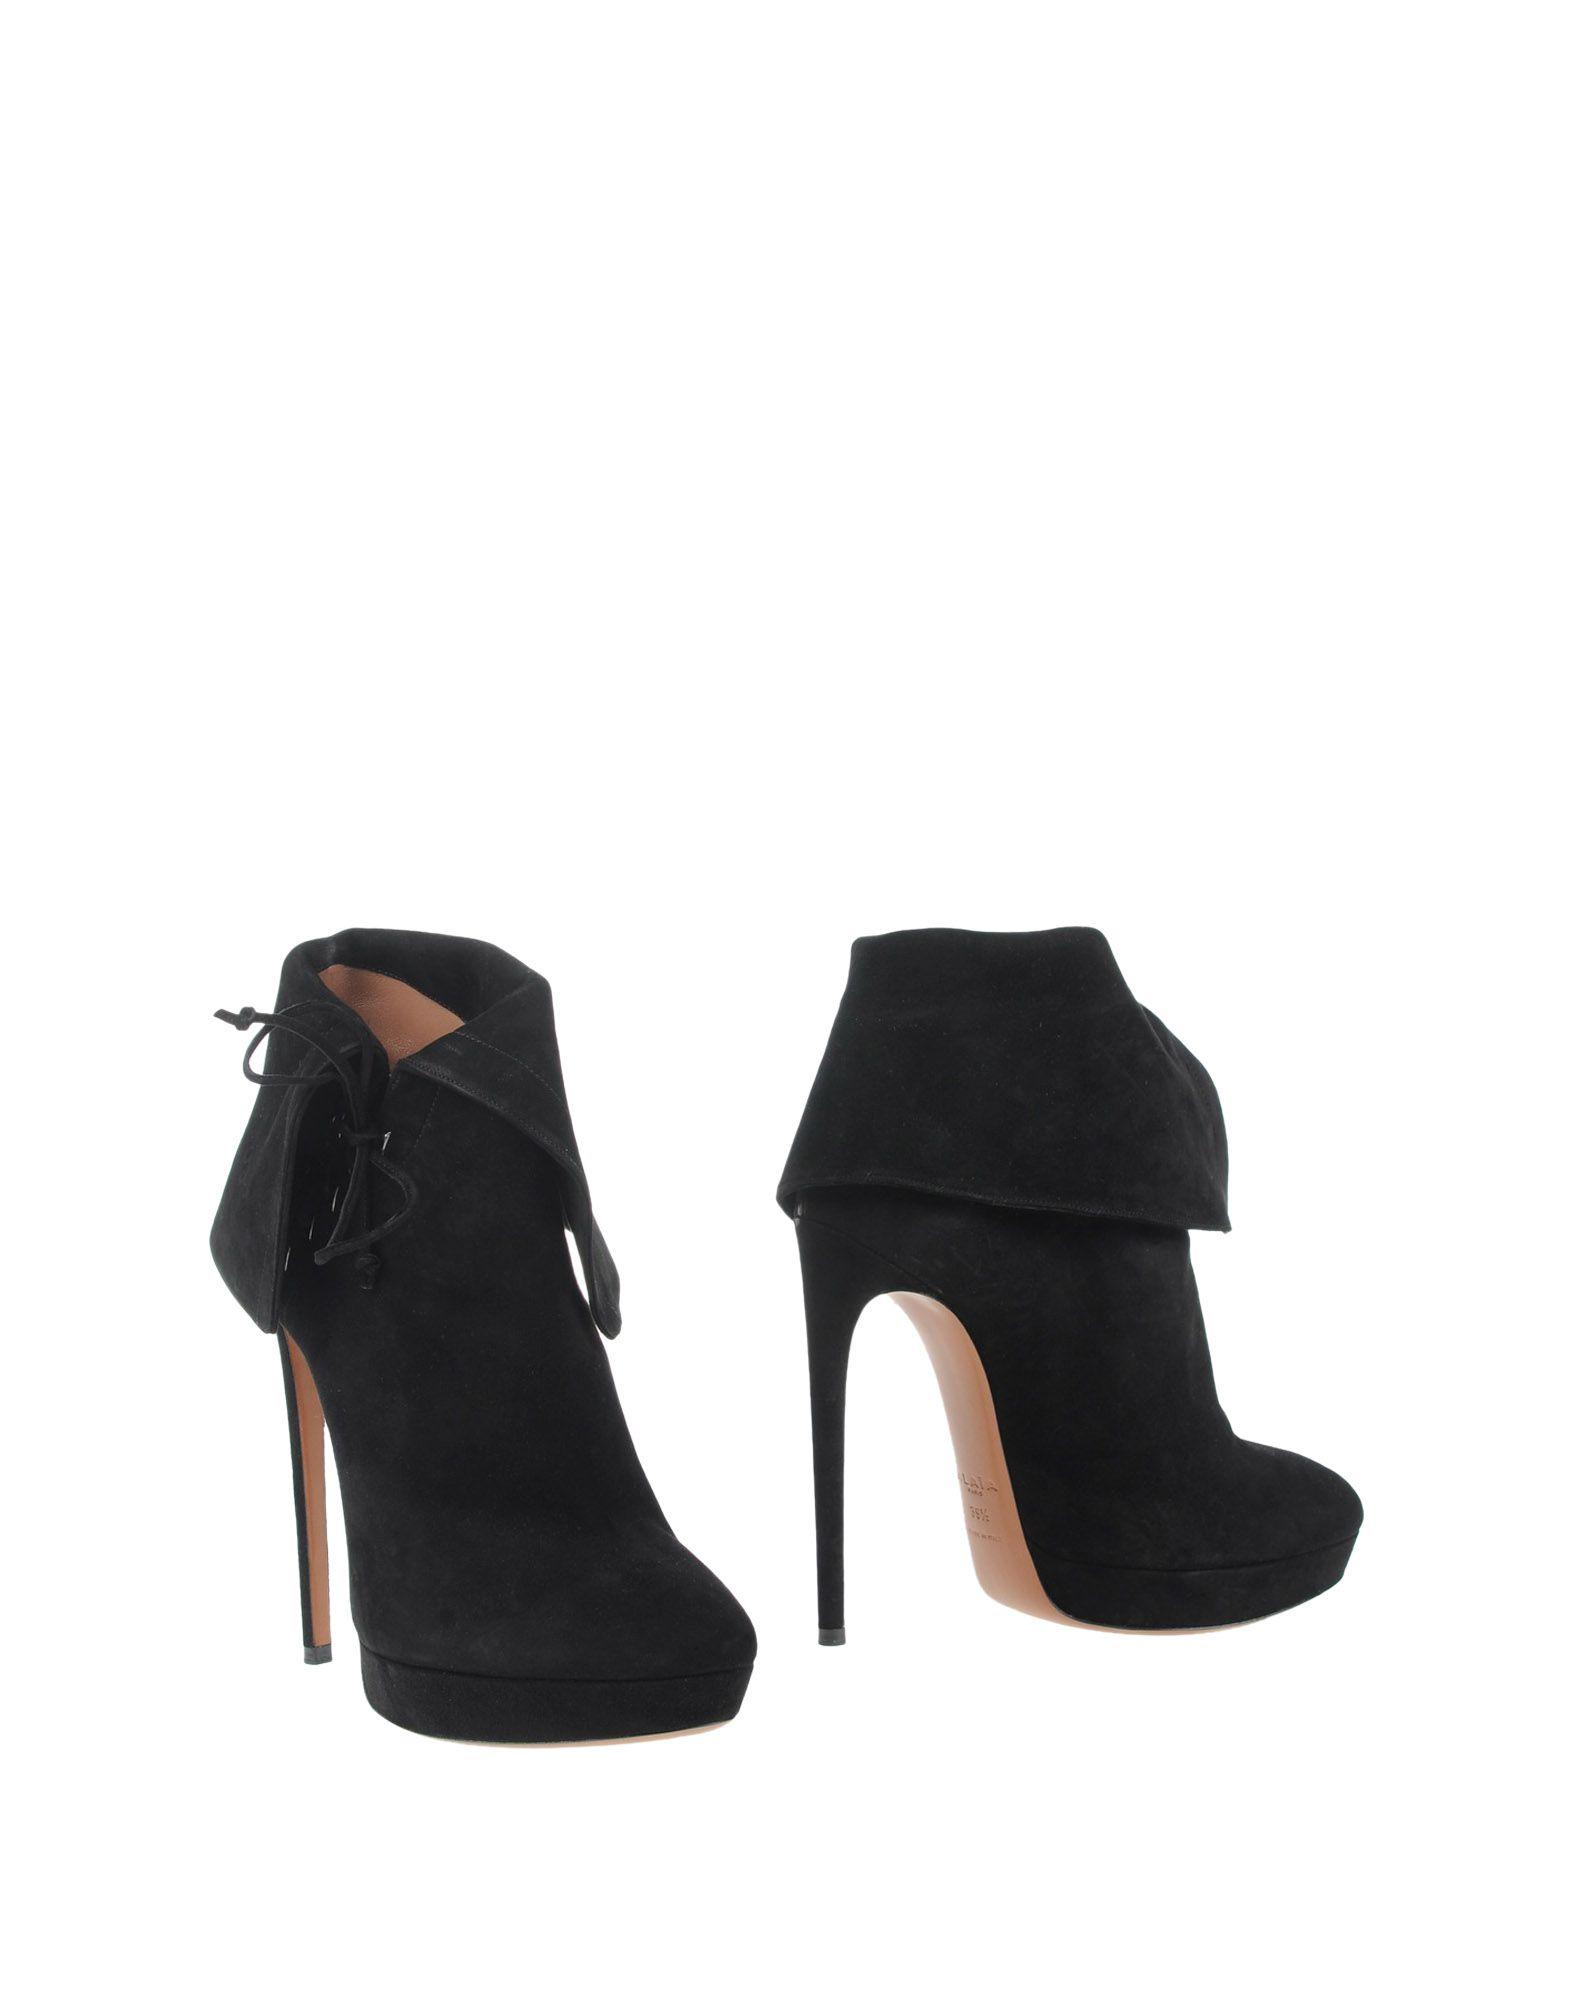 ALAÏA Ankle boots - FOOTWEAR D | YOOX.COM